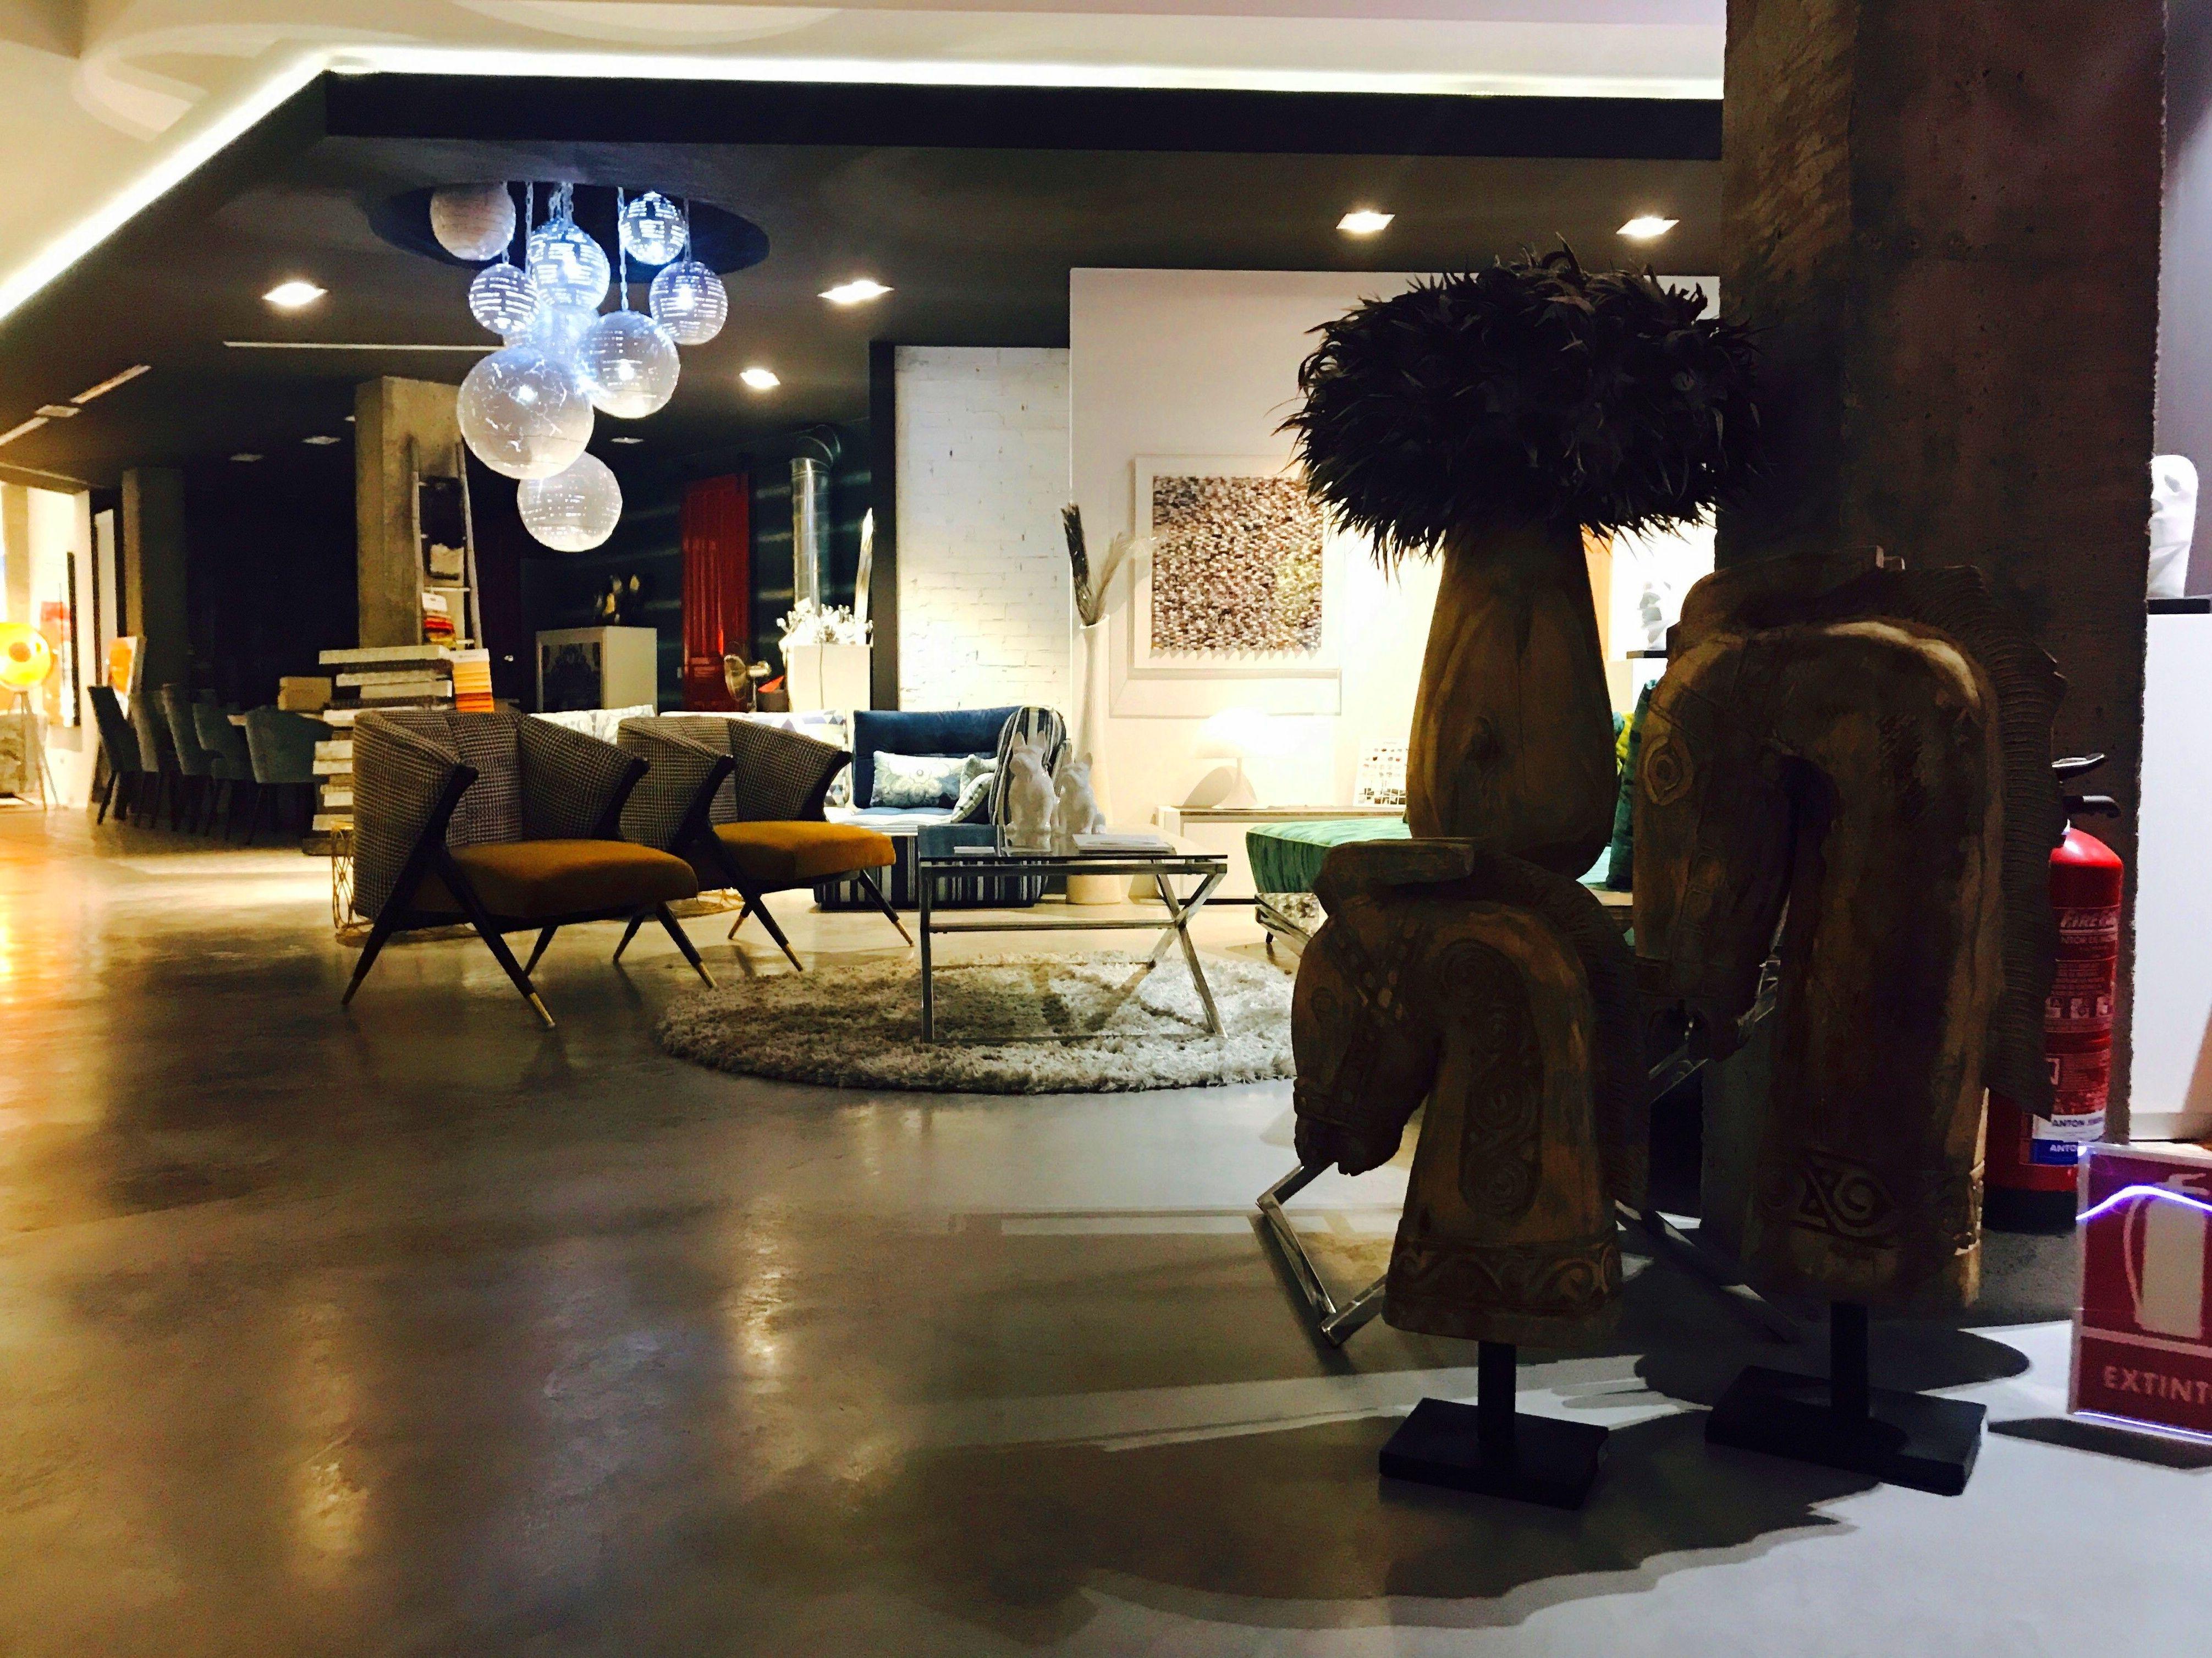 Foto 19 de Muebles en Getafe | Goga Muebles & Complementos